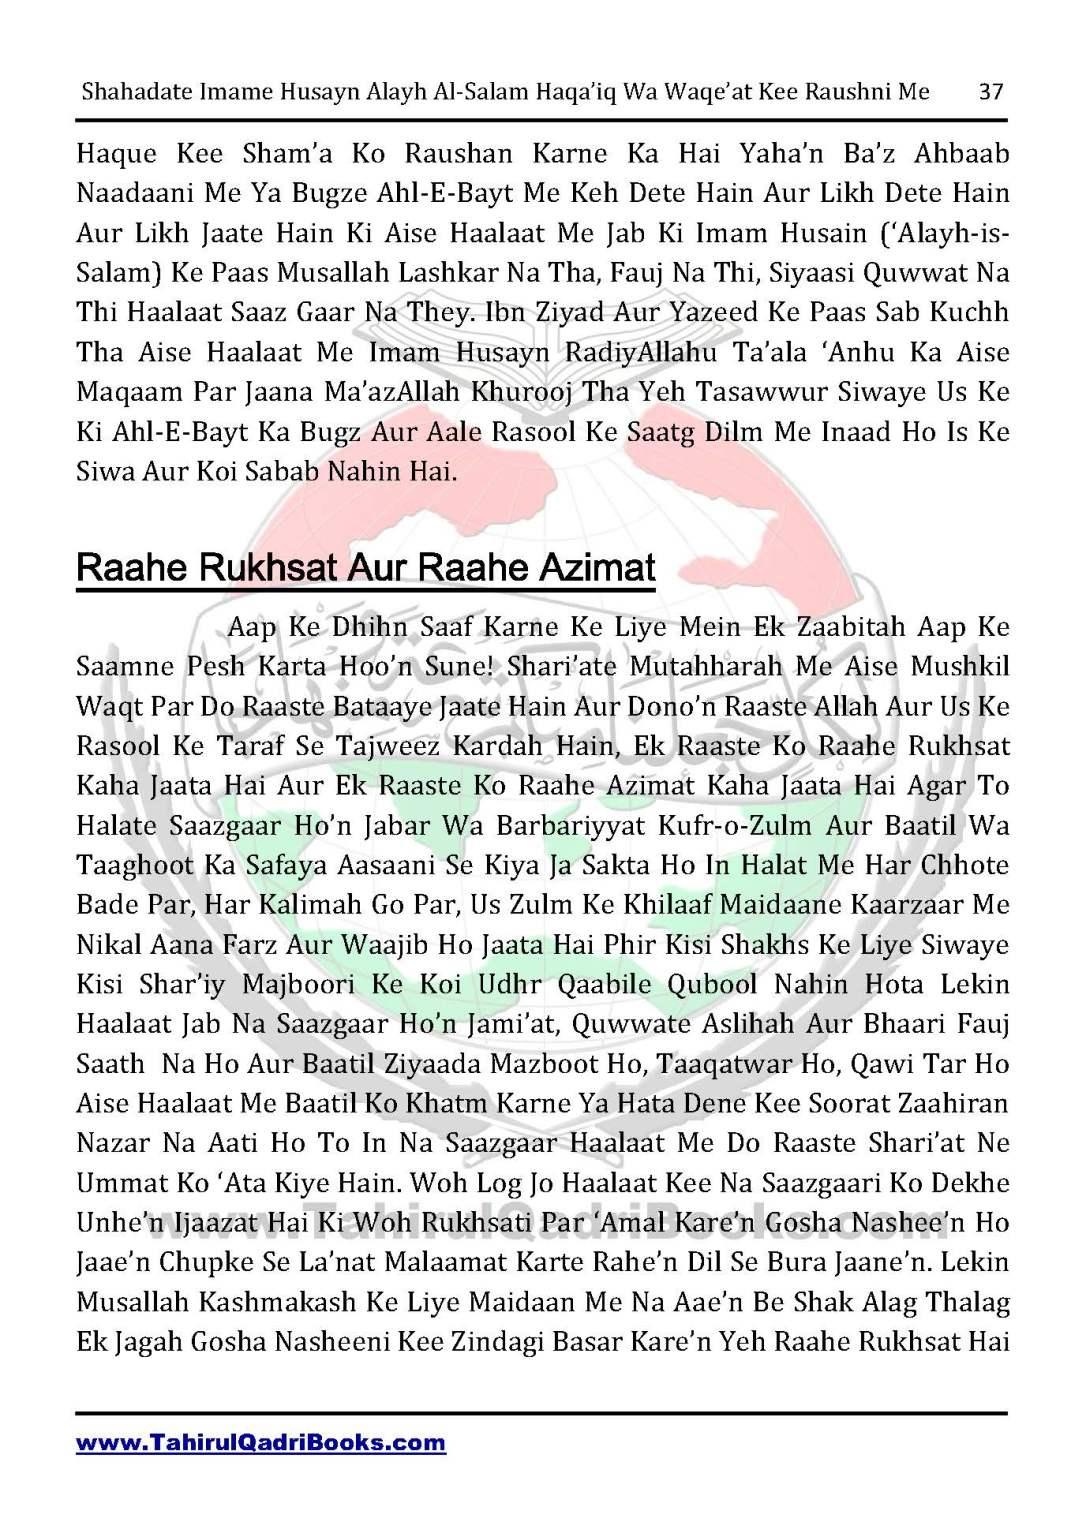 shahadate-imame-husayn-alayh-is-salam-haqaiq-wa-waqe_at-kee-raushni-me-in-roman-urdu-unlocked_Page_37